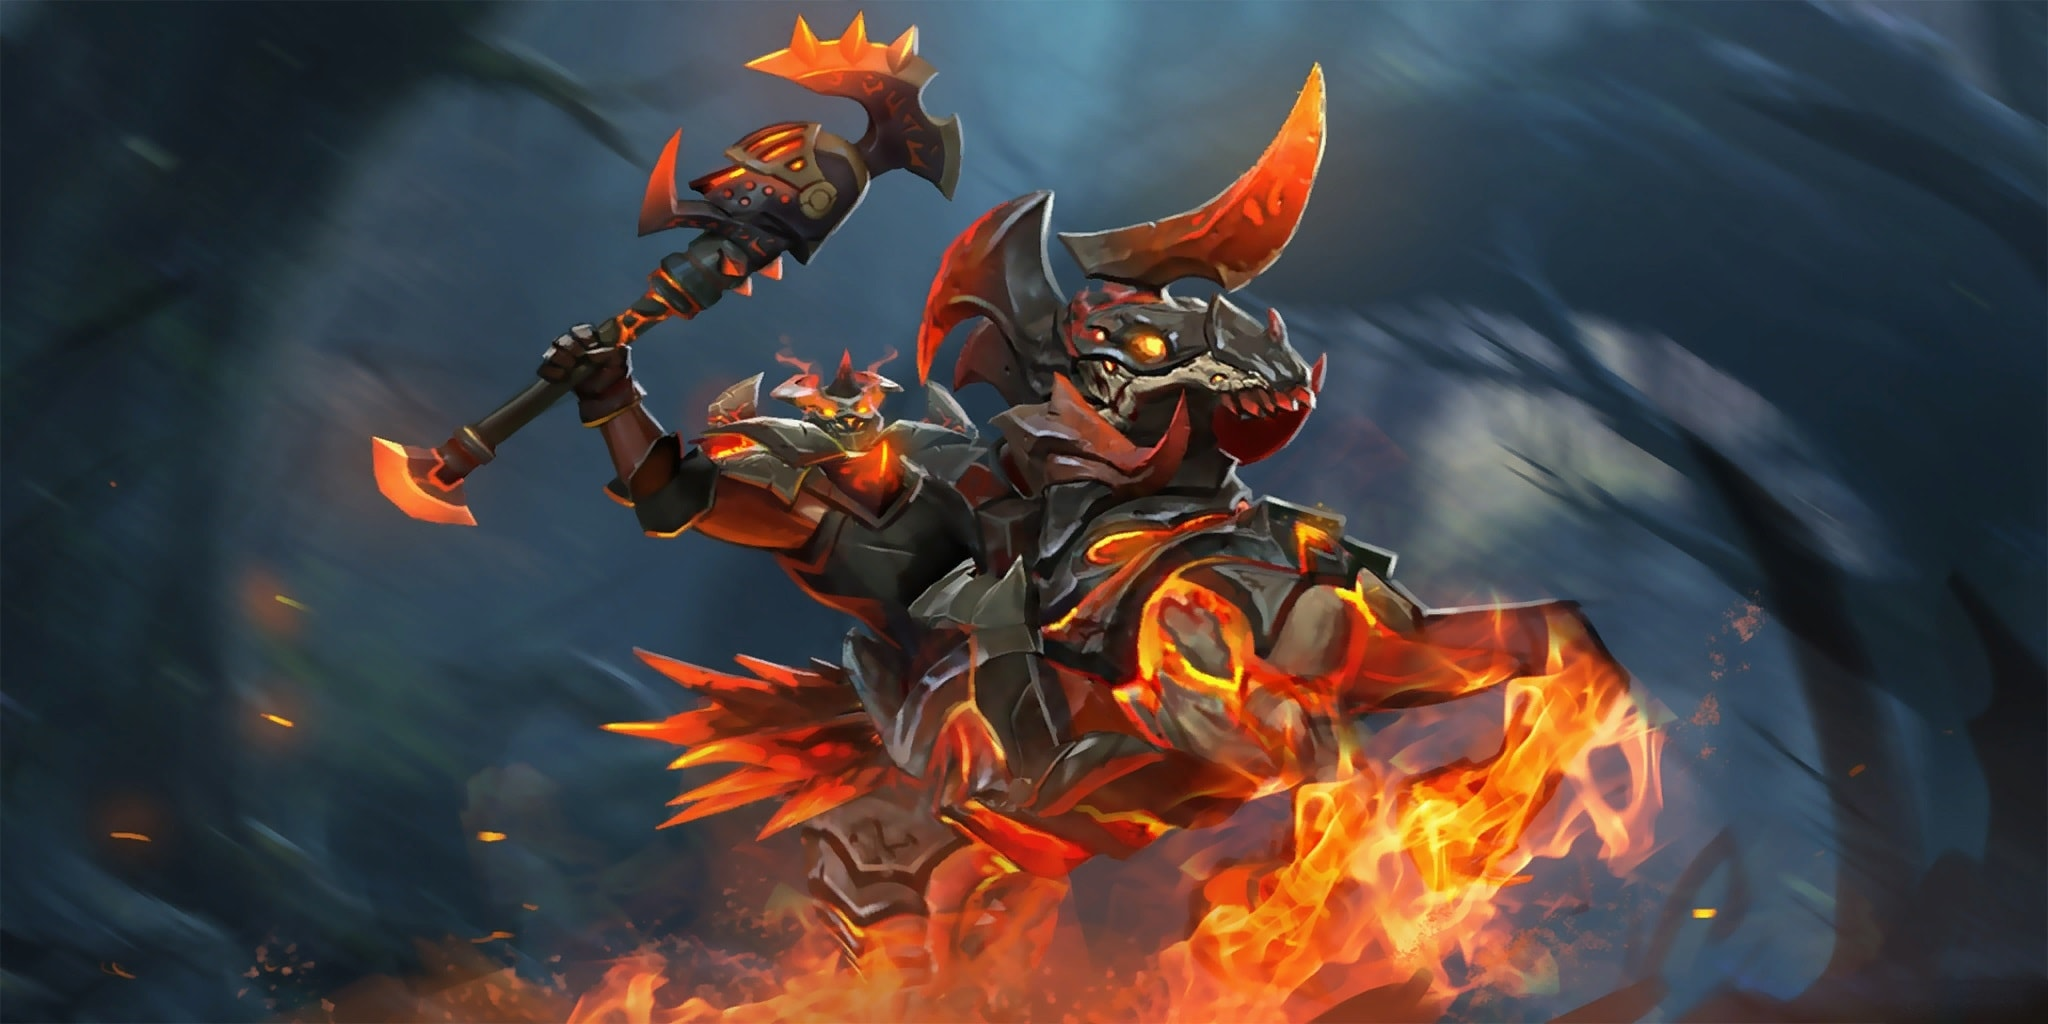 Dota2 : Chaos Knight Background